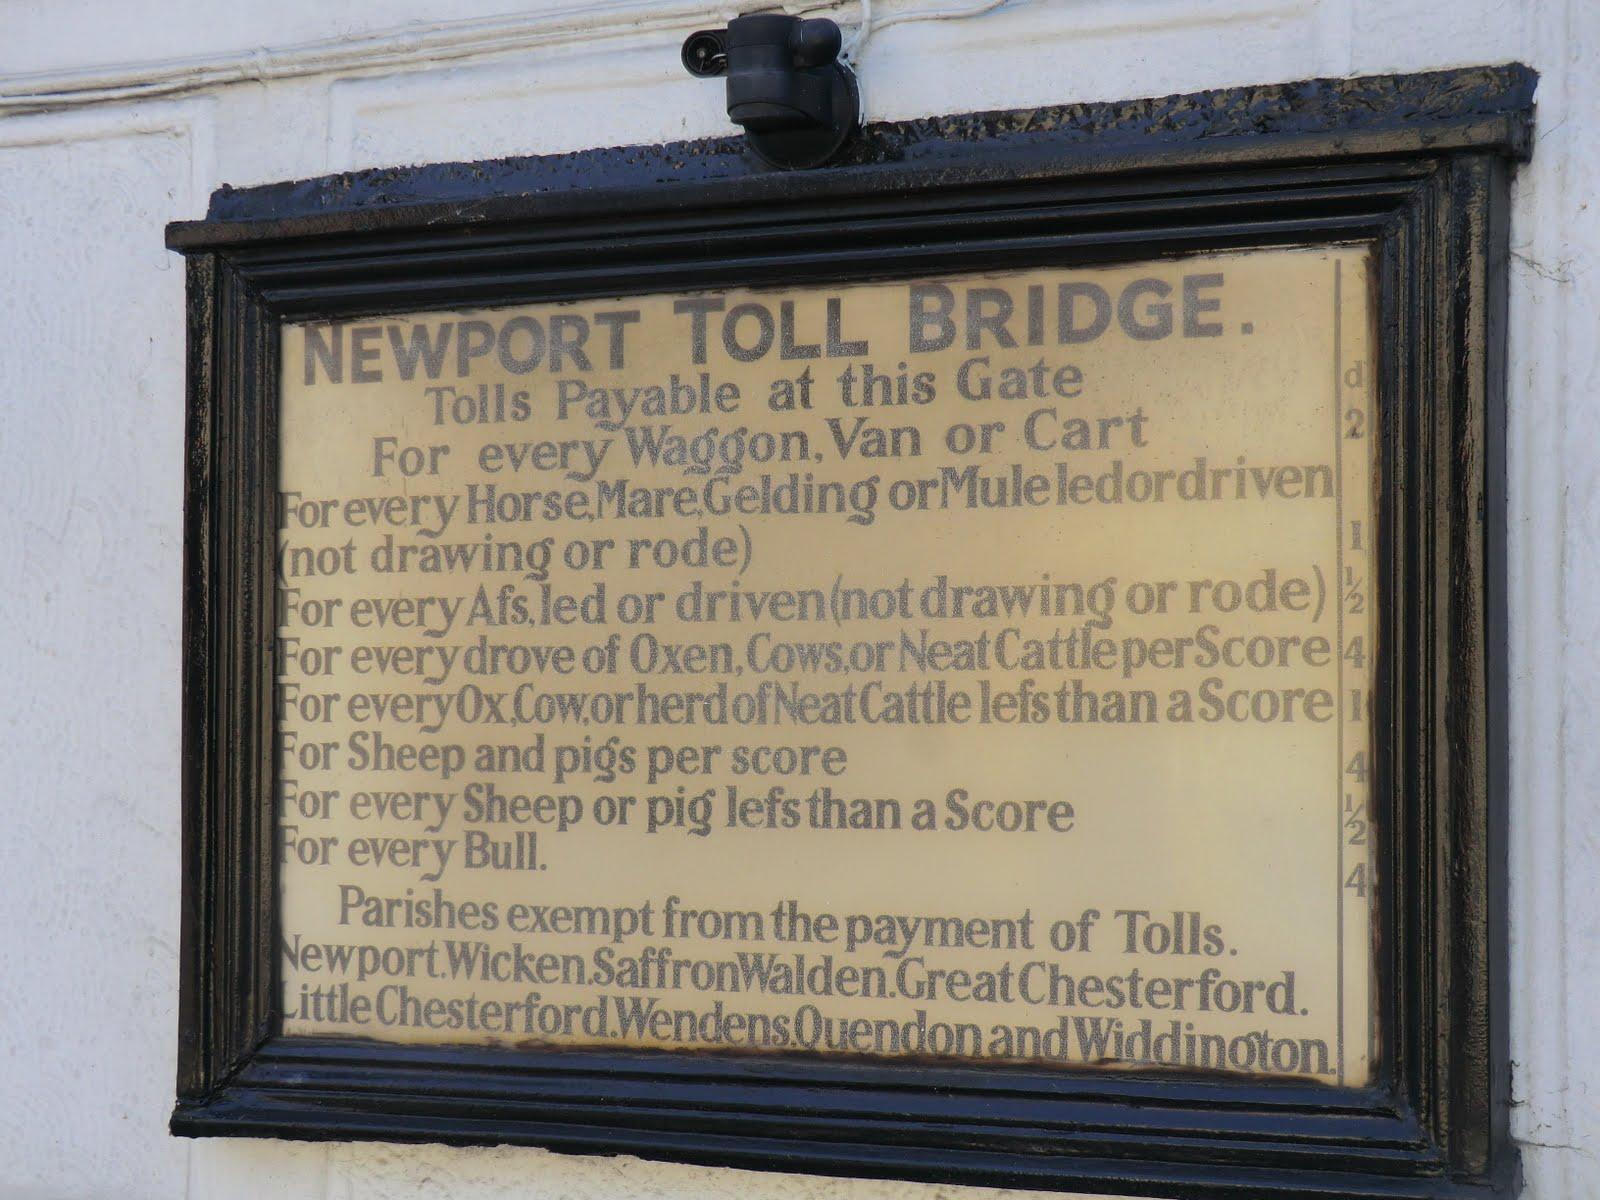 CIMG6078 Newport Toll Bridge